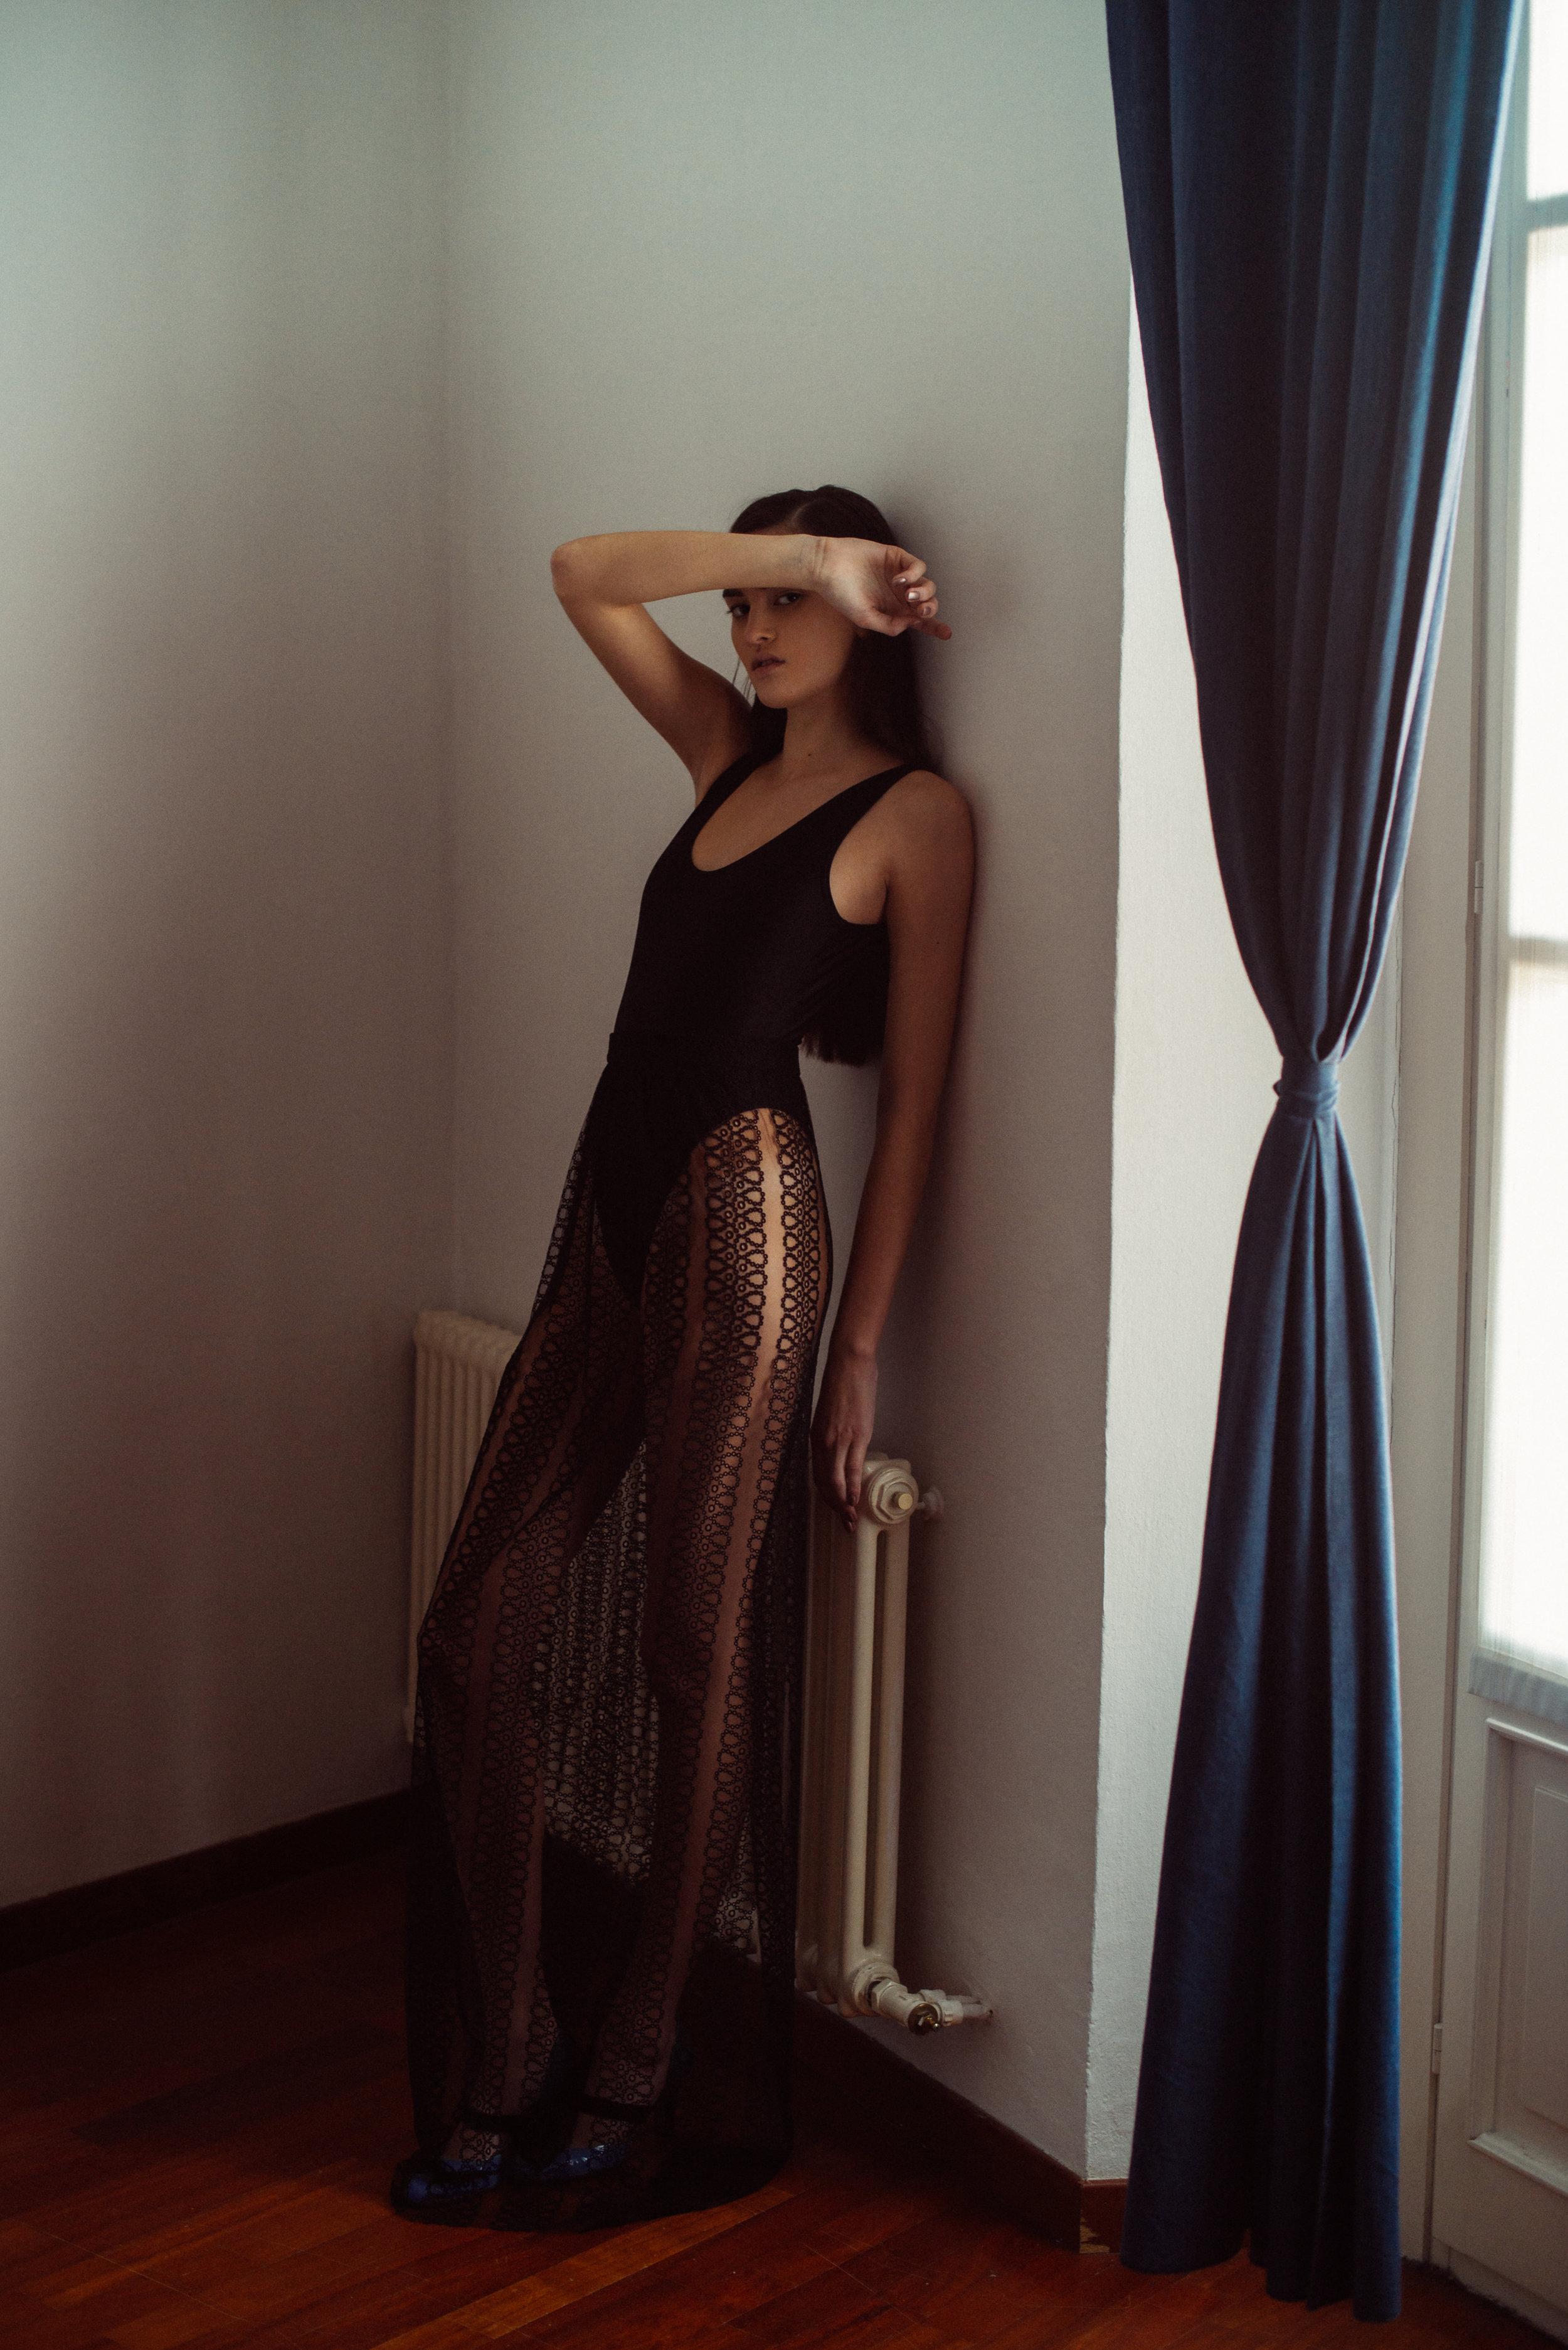 body STYLIST'S OWN, gown  BURBERRY , shoes  BOTTEGA VENETA